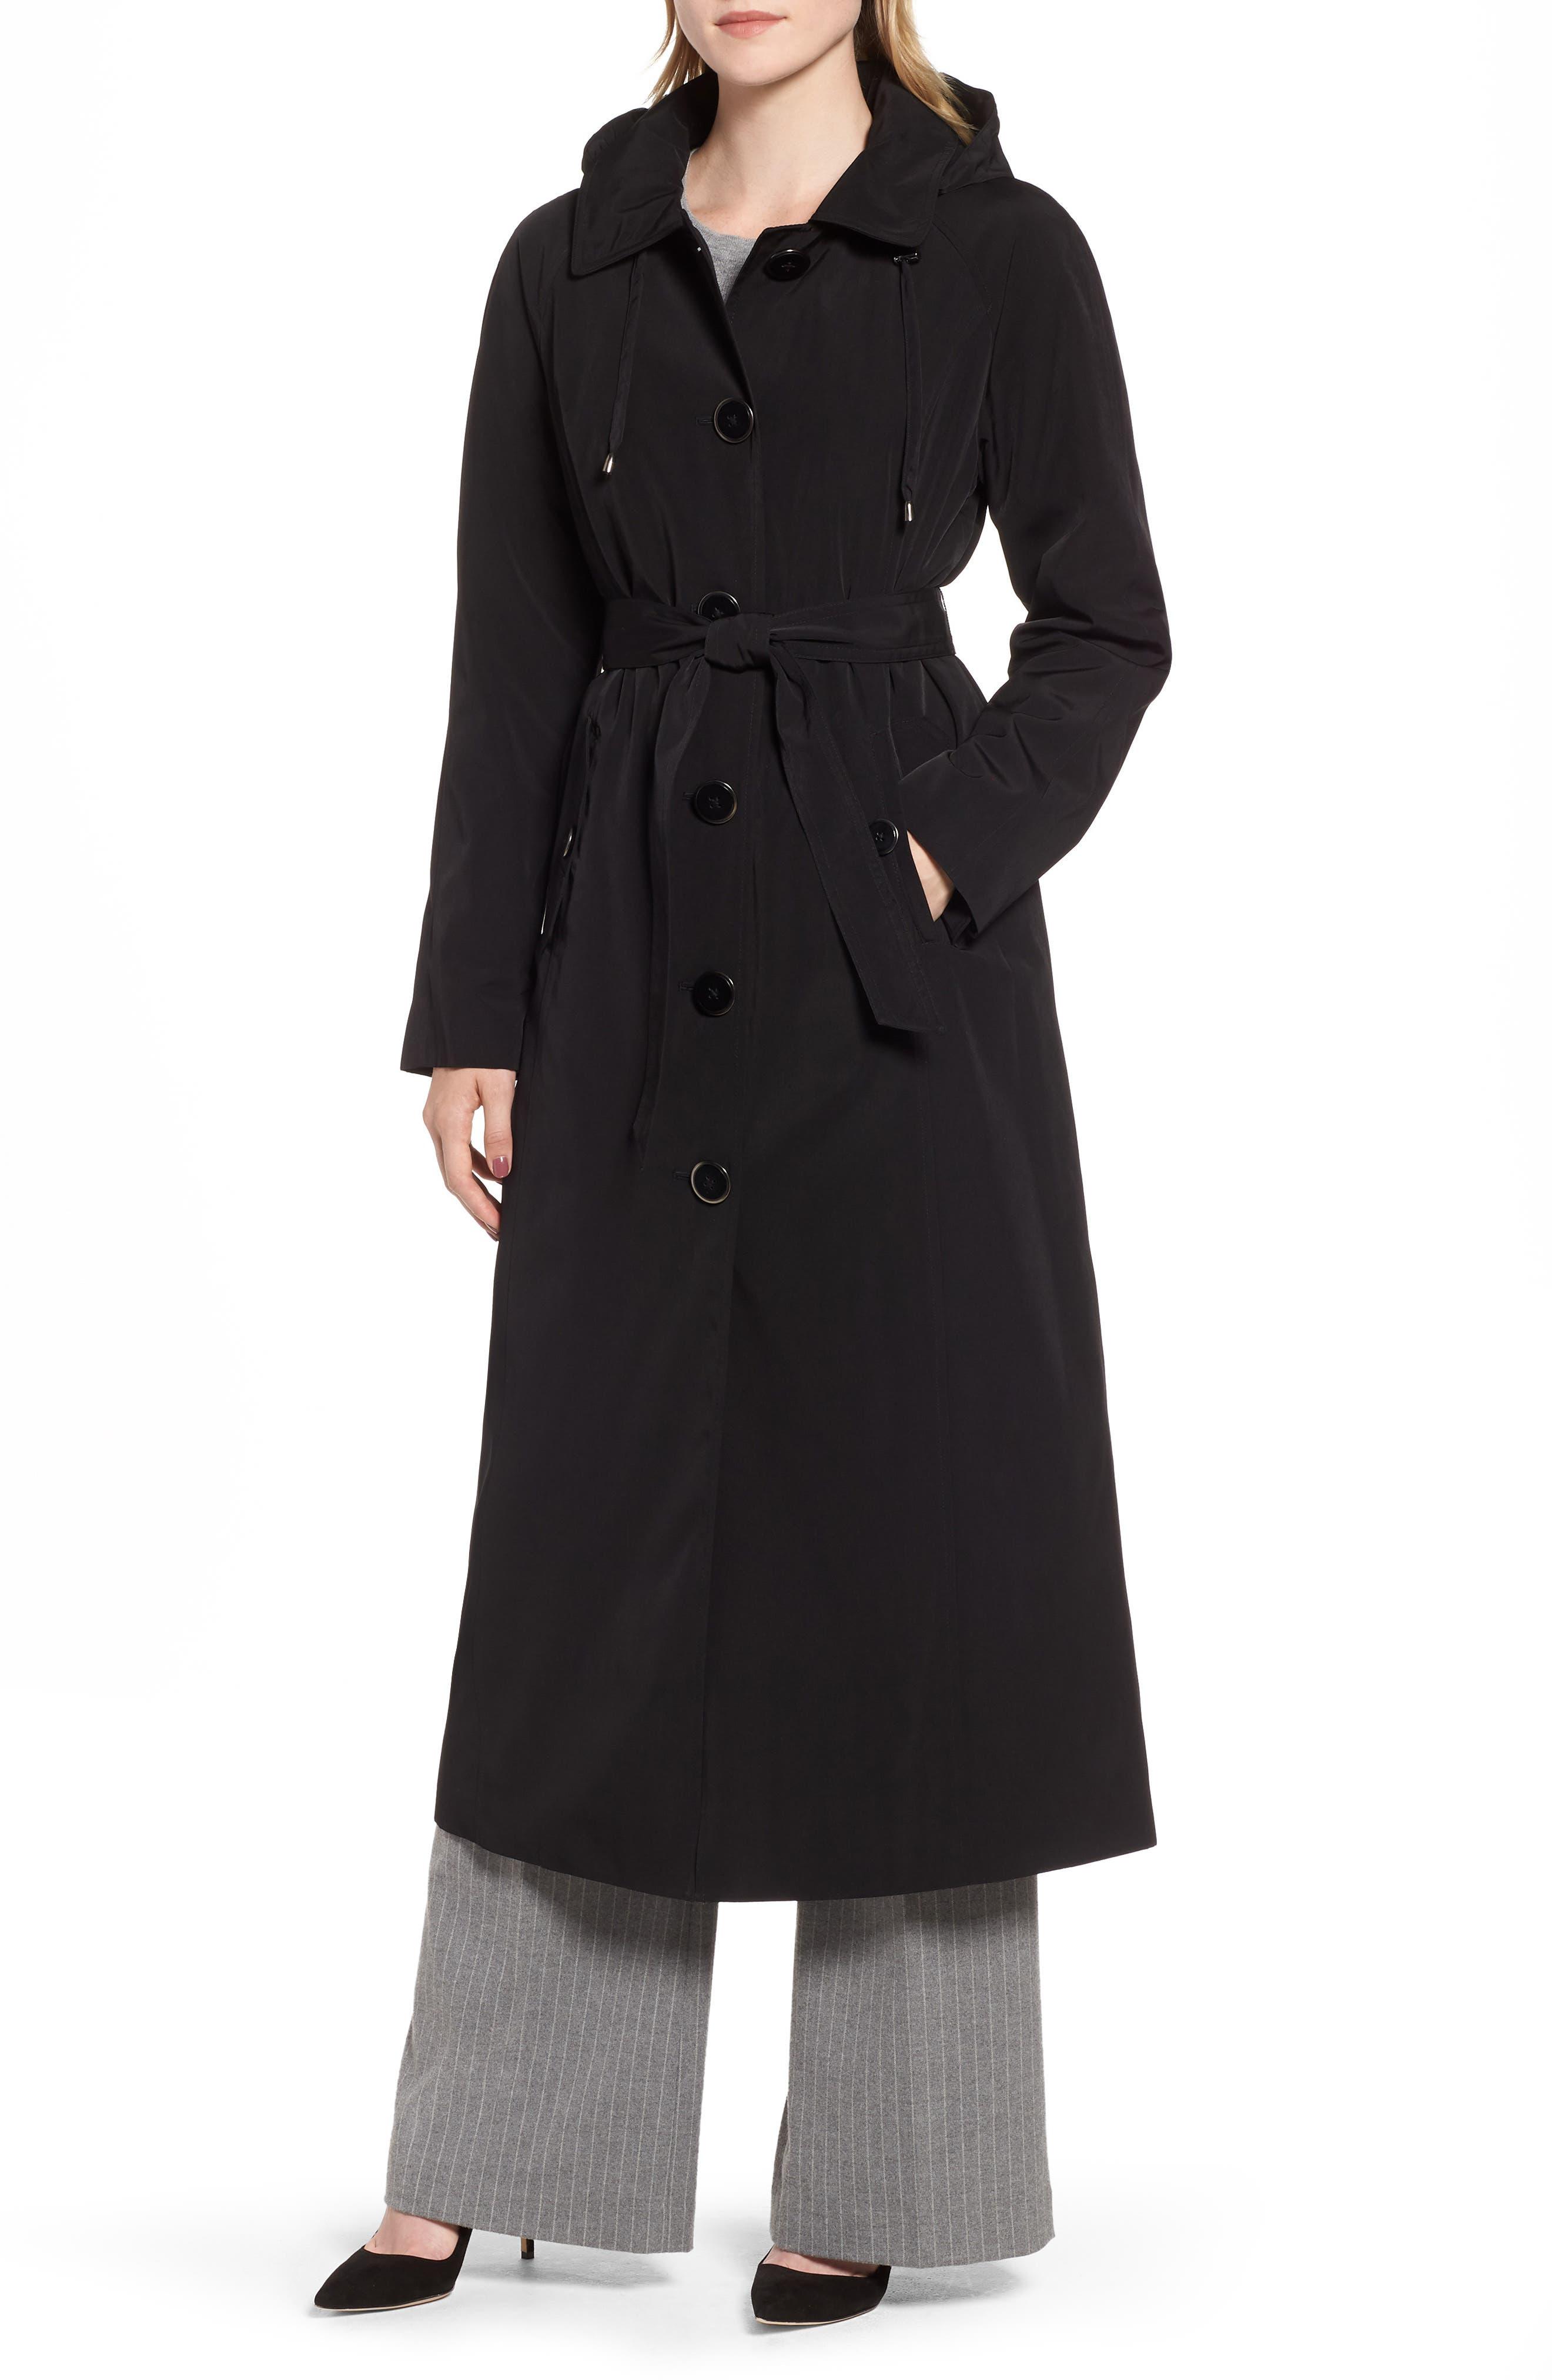 LONDON FOG, Long Trench Coat with Detachable Hood & Liner, Main thumbnail 1, color, BLACK